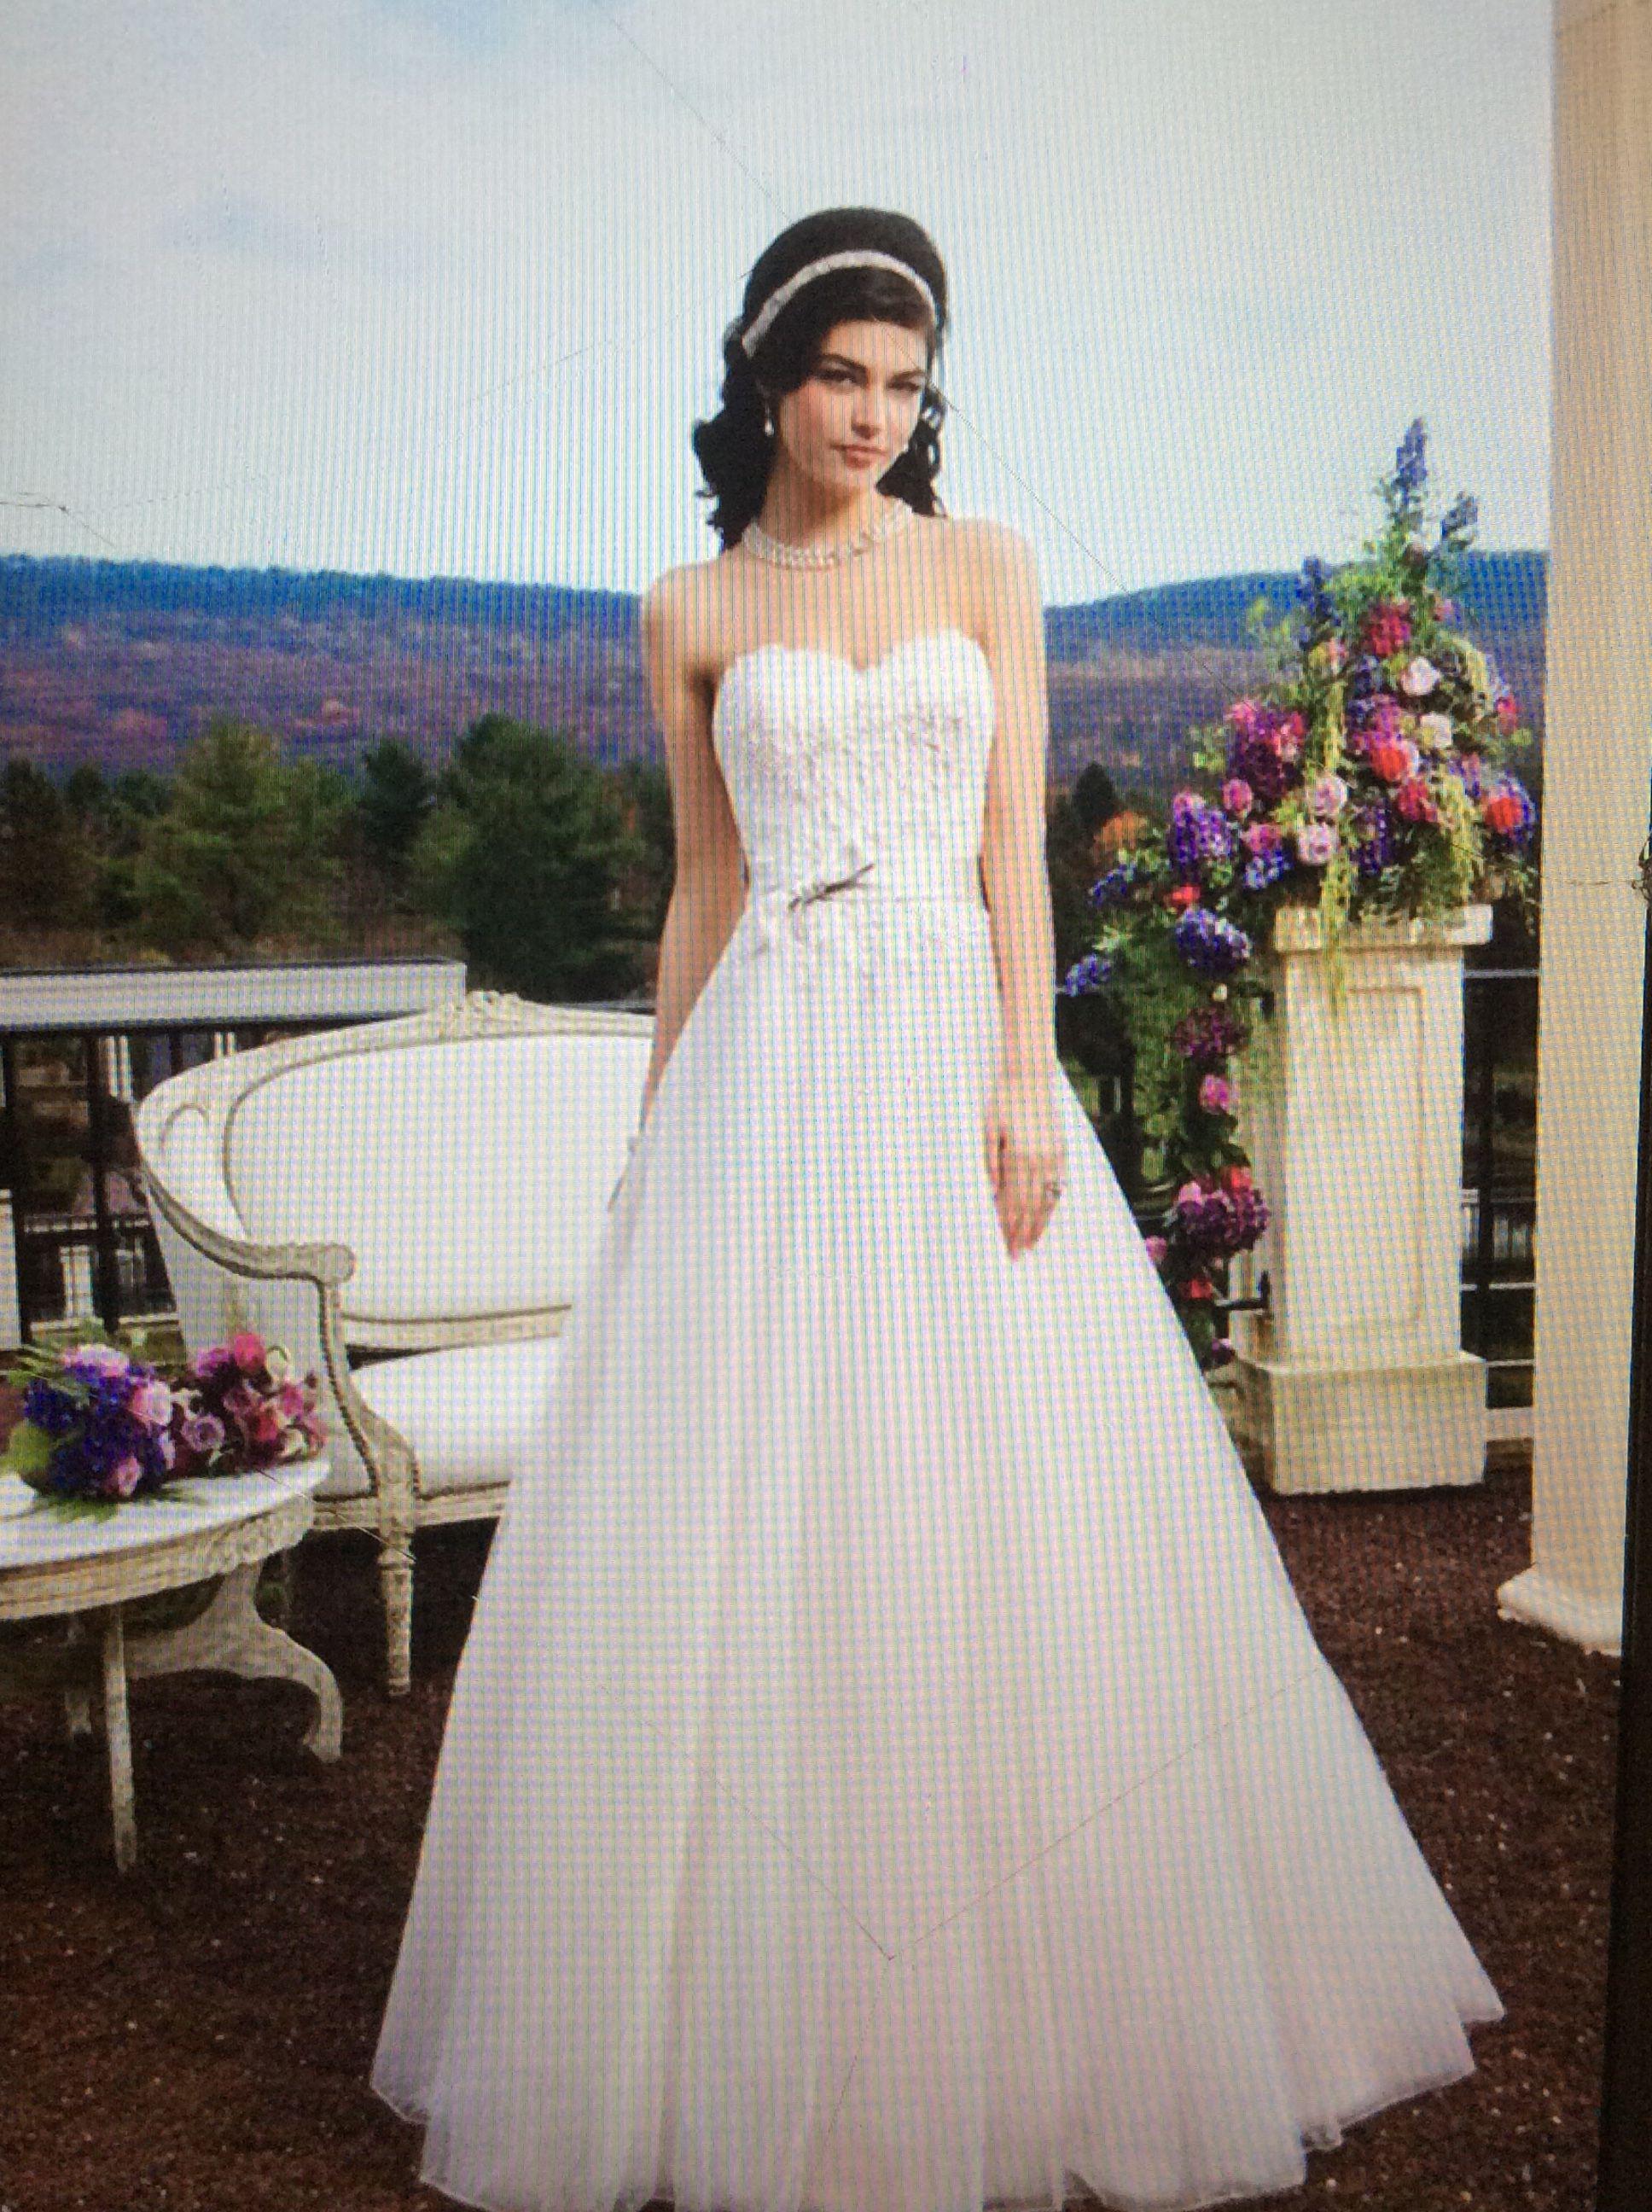 Pin by ruth turner on wedding dress pinterest wedding dress and